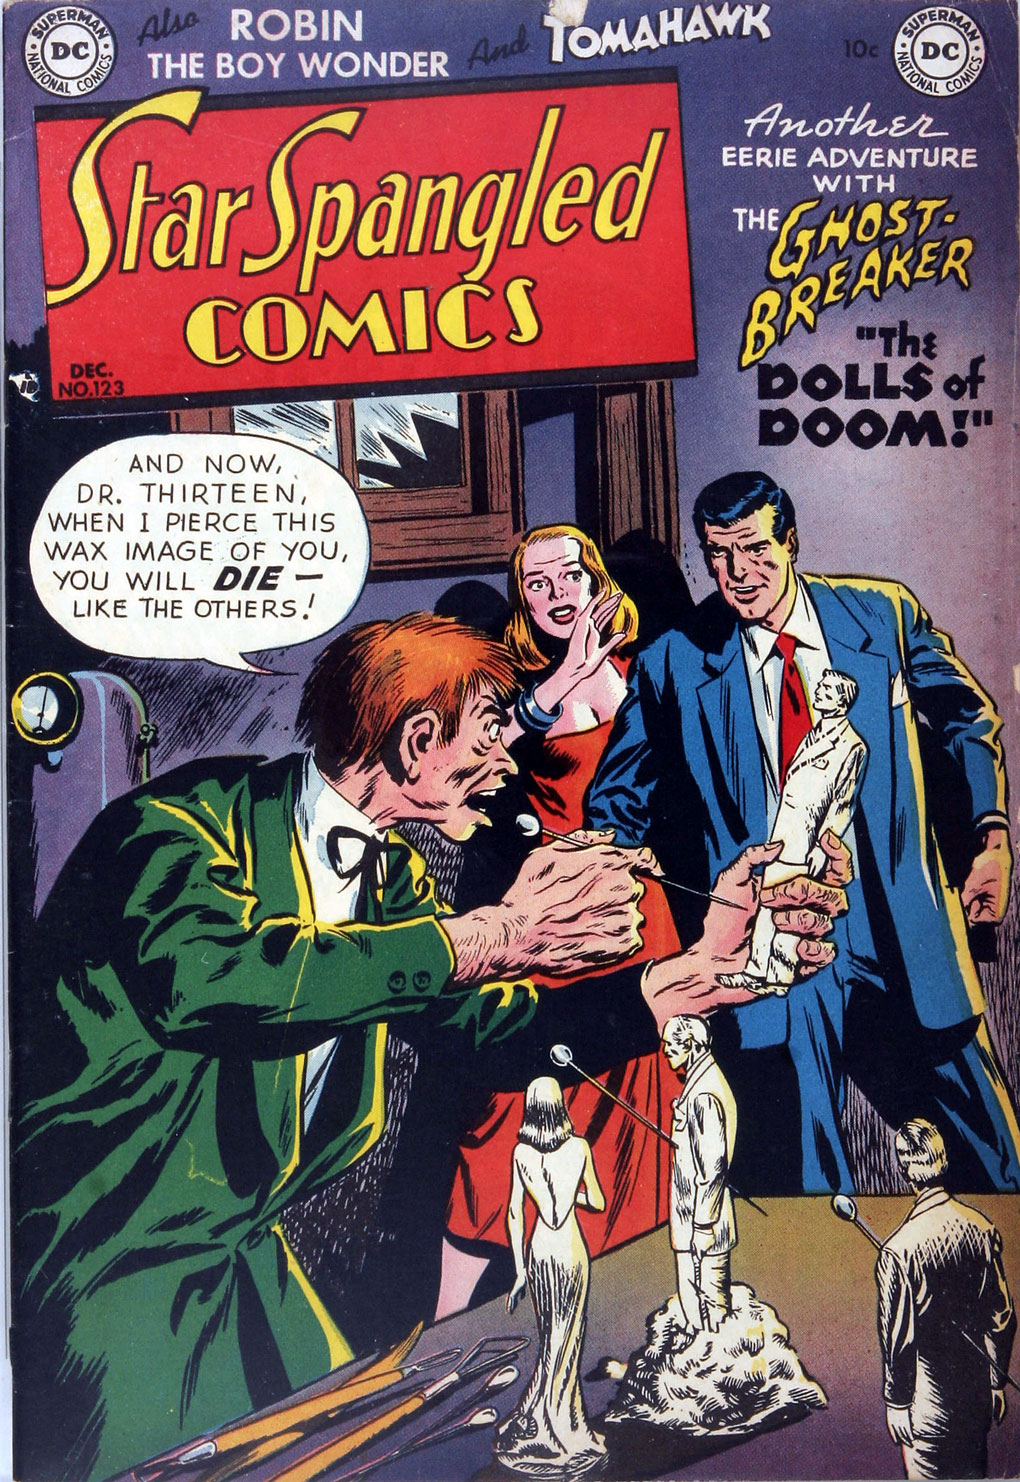 Star Spangled Comics (1941) 123 Page 1